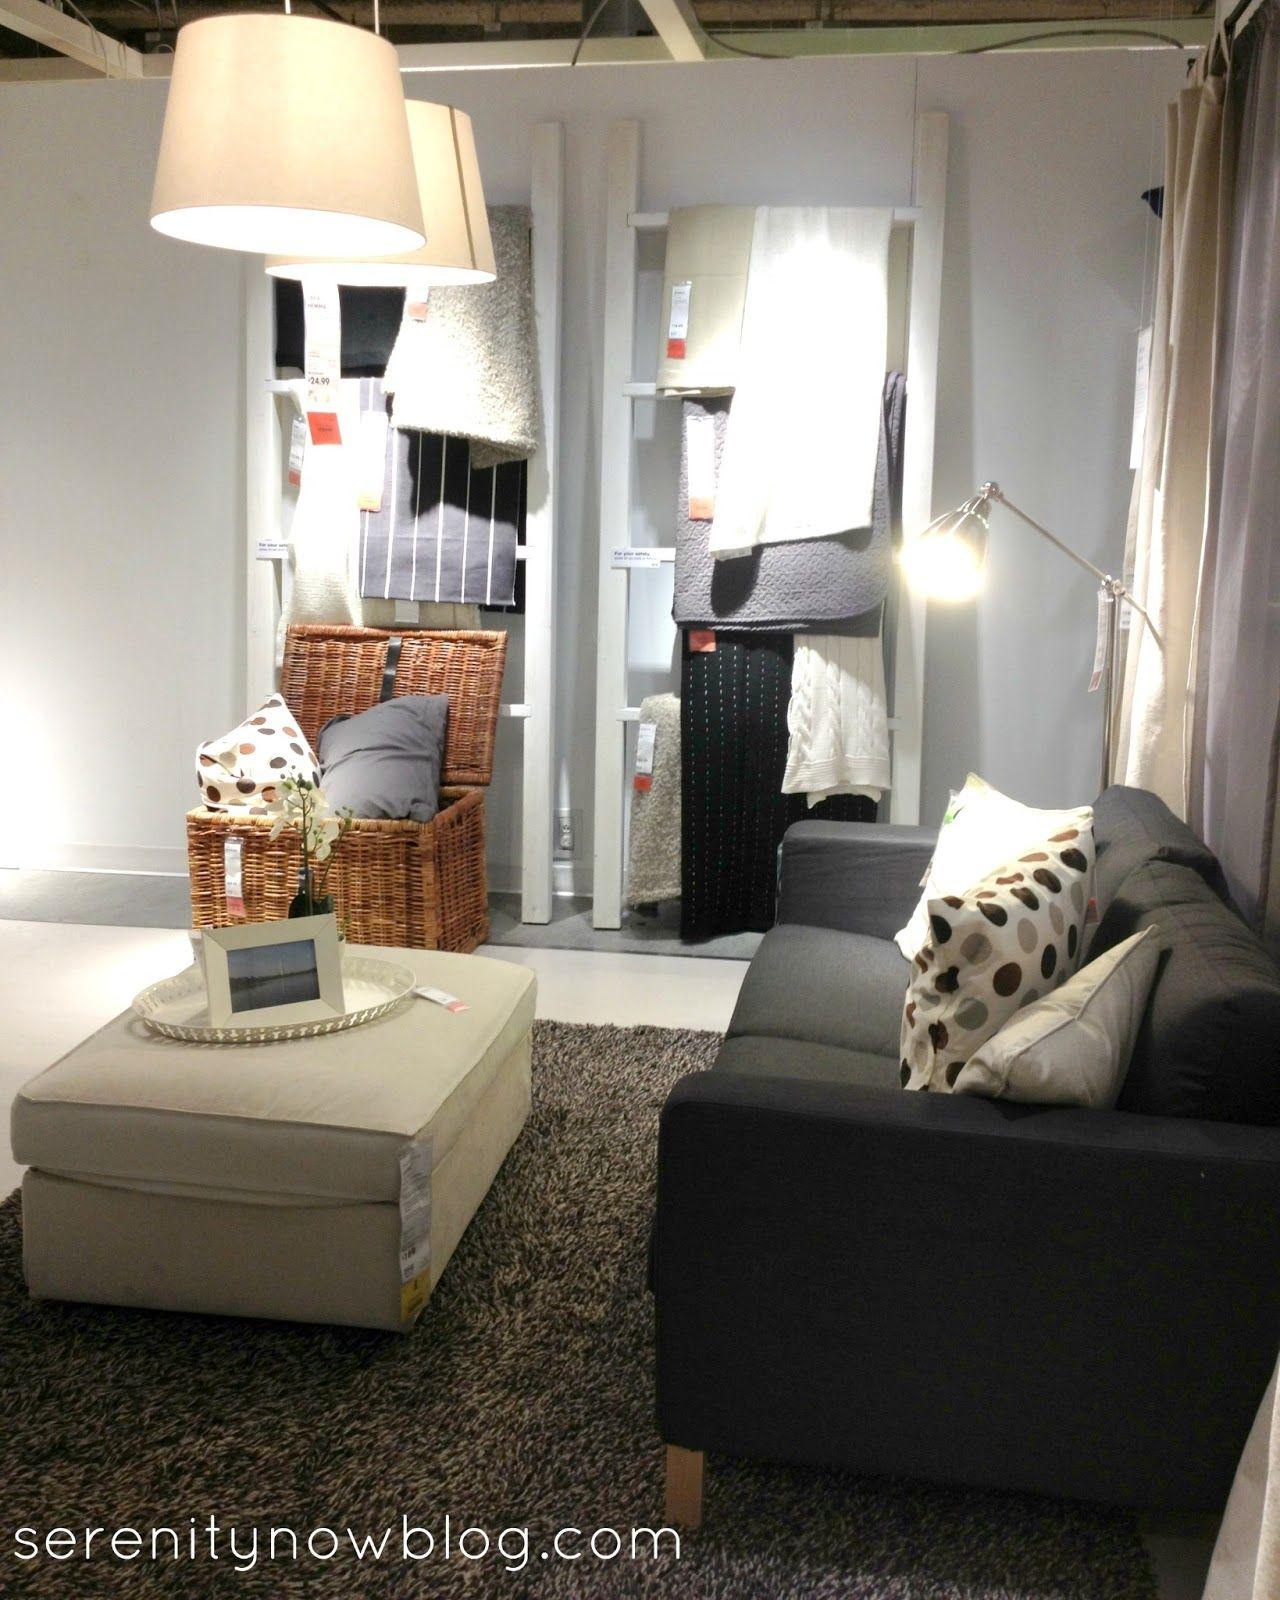 IKEA Home Decor Ideas (March 2013), from Amanda {Serenity